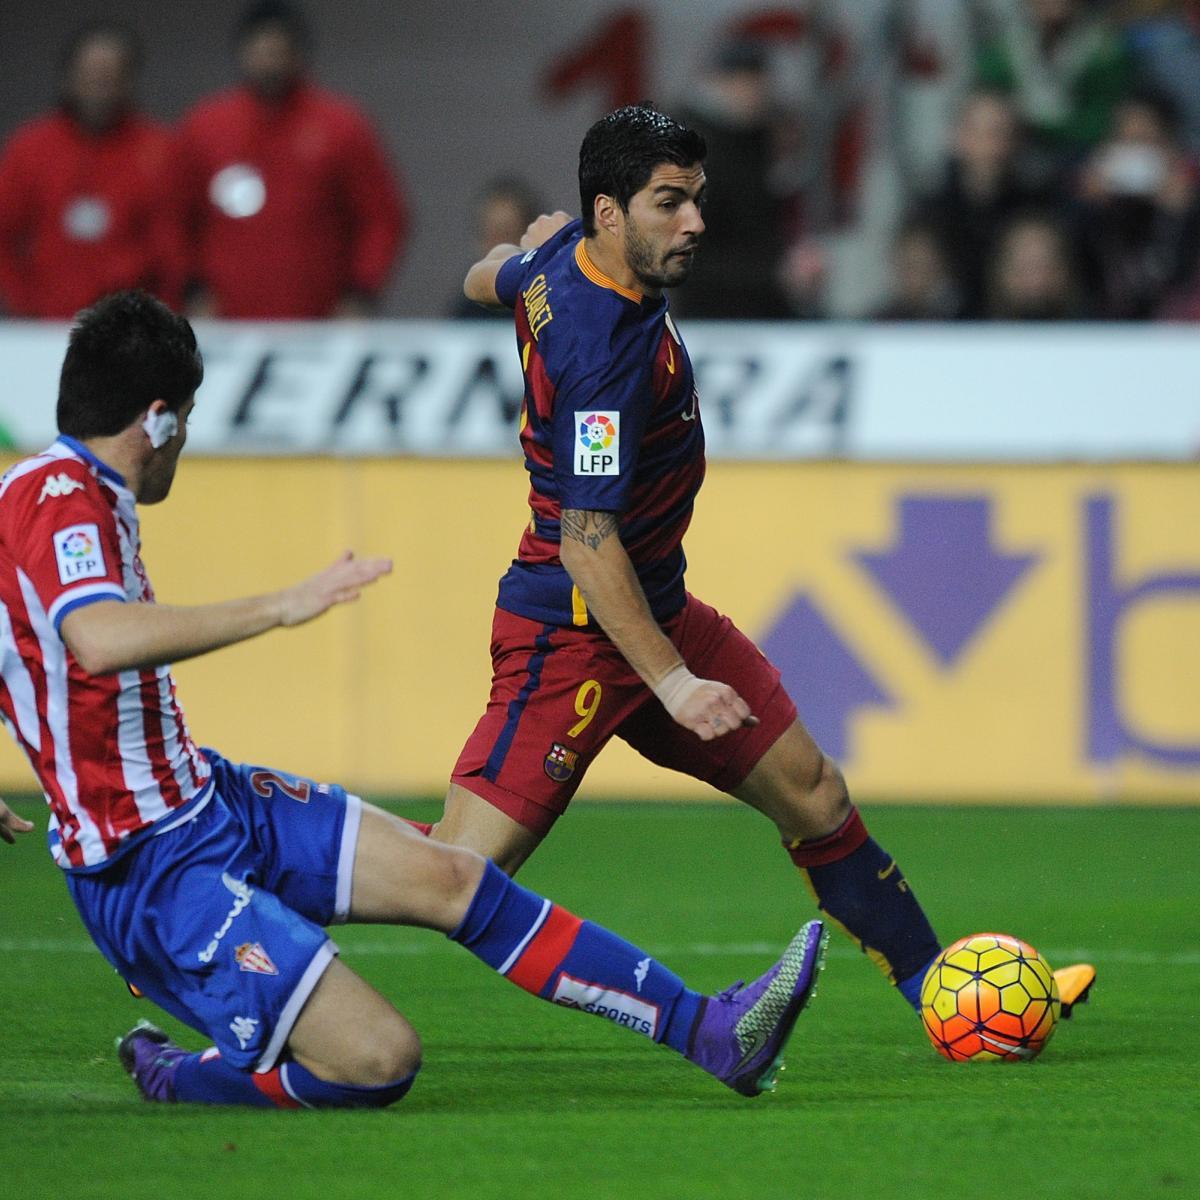 Liverpool V Barcelona Live Matchday Blog: Barcelona Vs. Sporting Gijon: Live Score, Highlights From